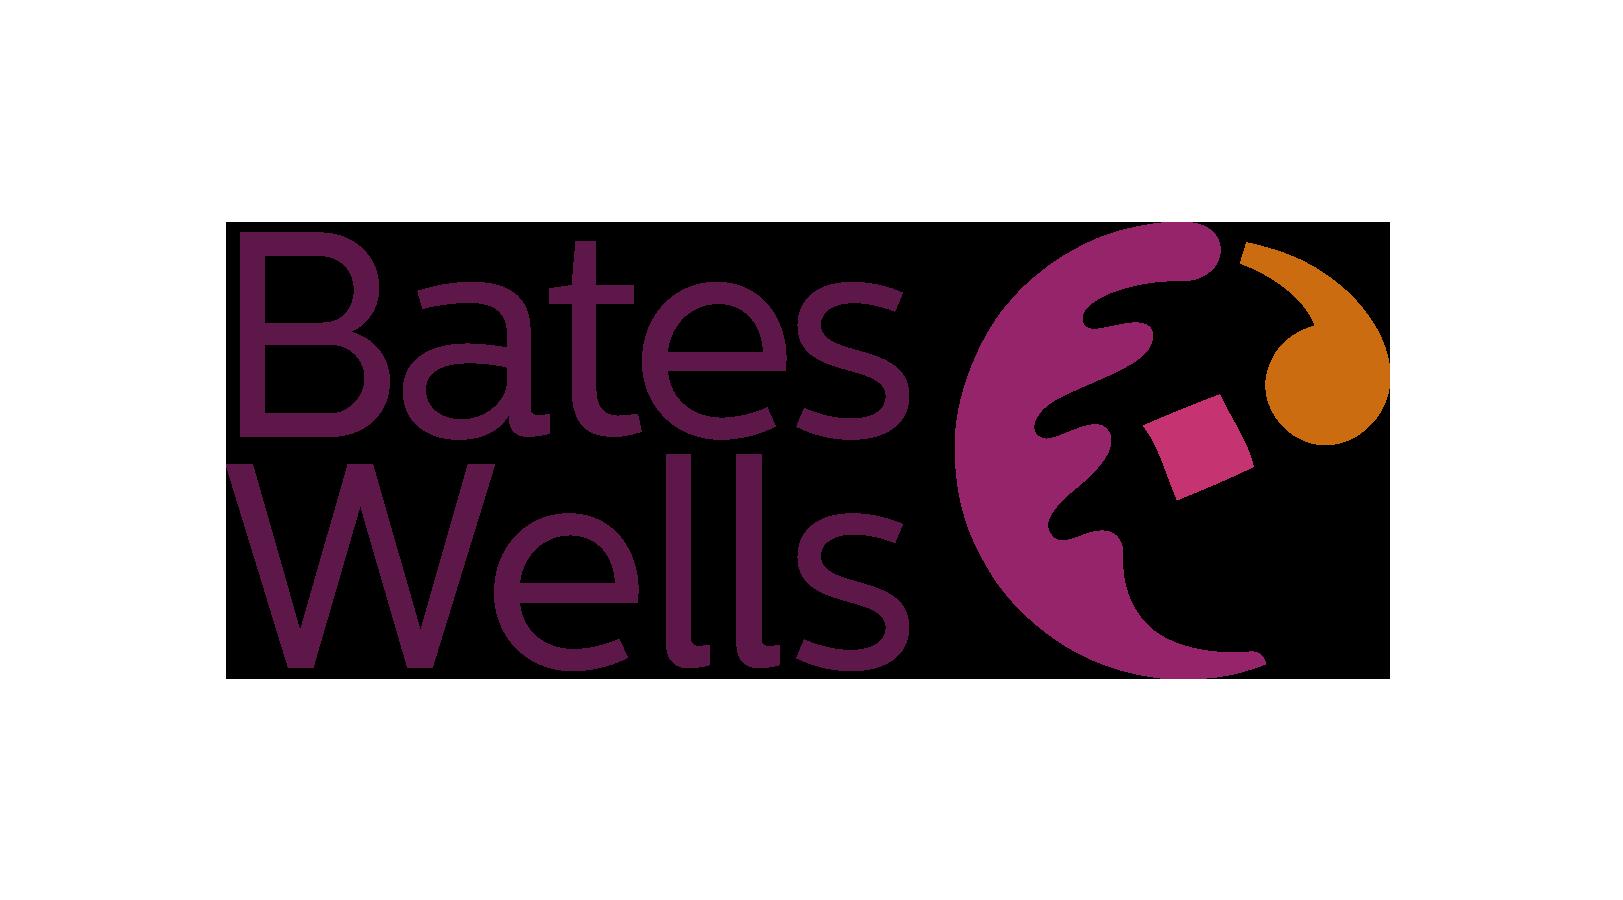 Logo for Bates Wells